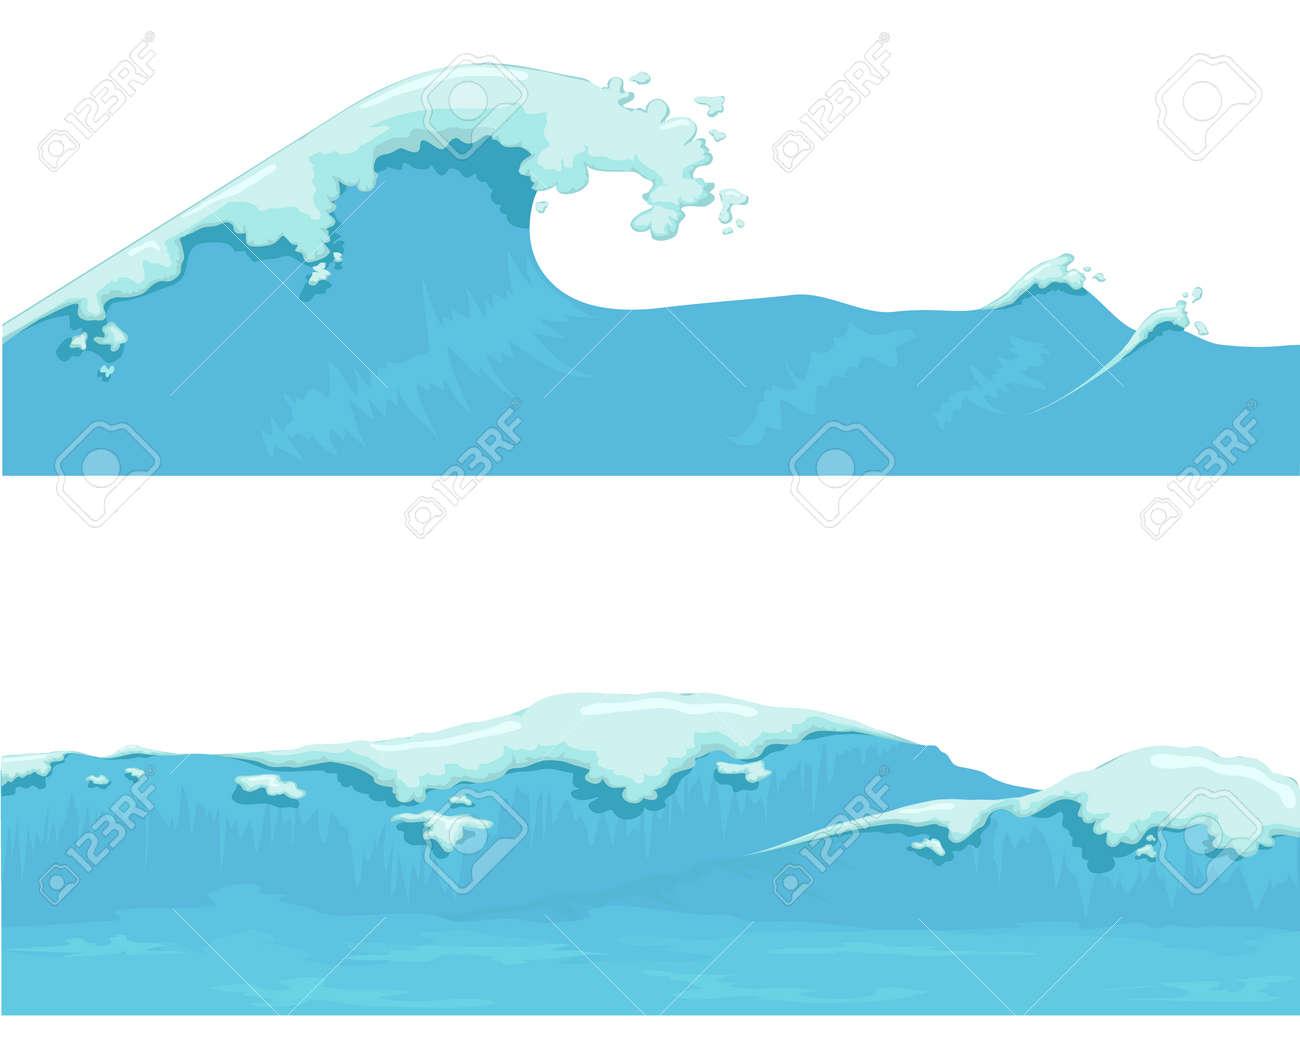 Blue Ocean Wave, giant wave - 50129529